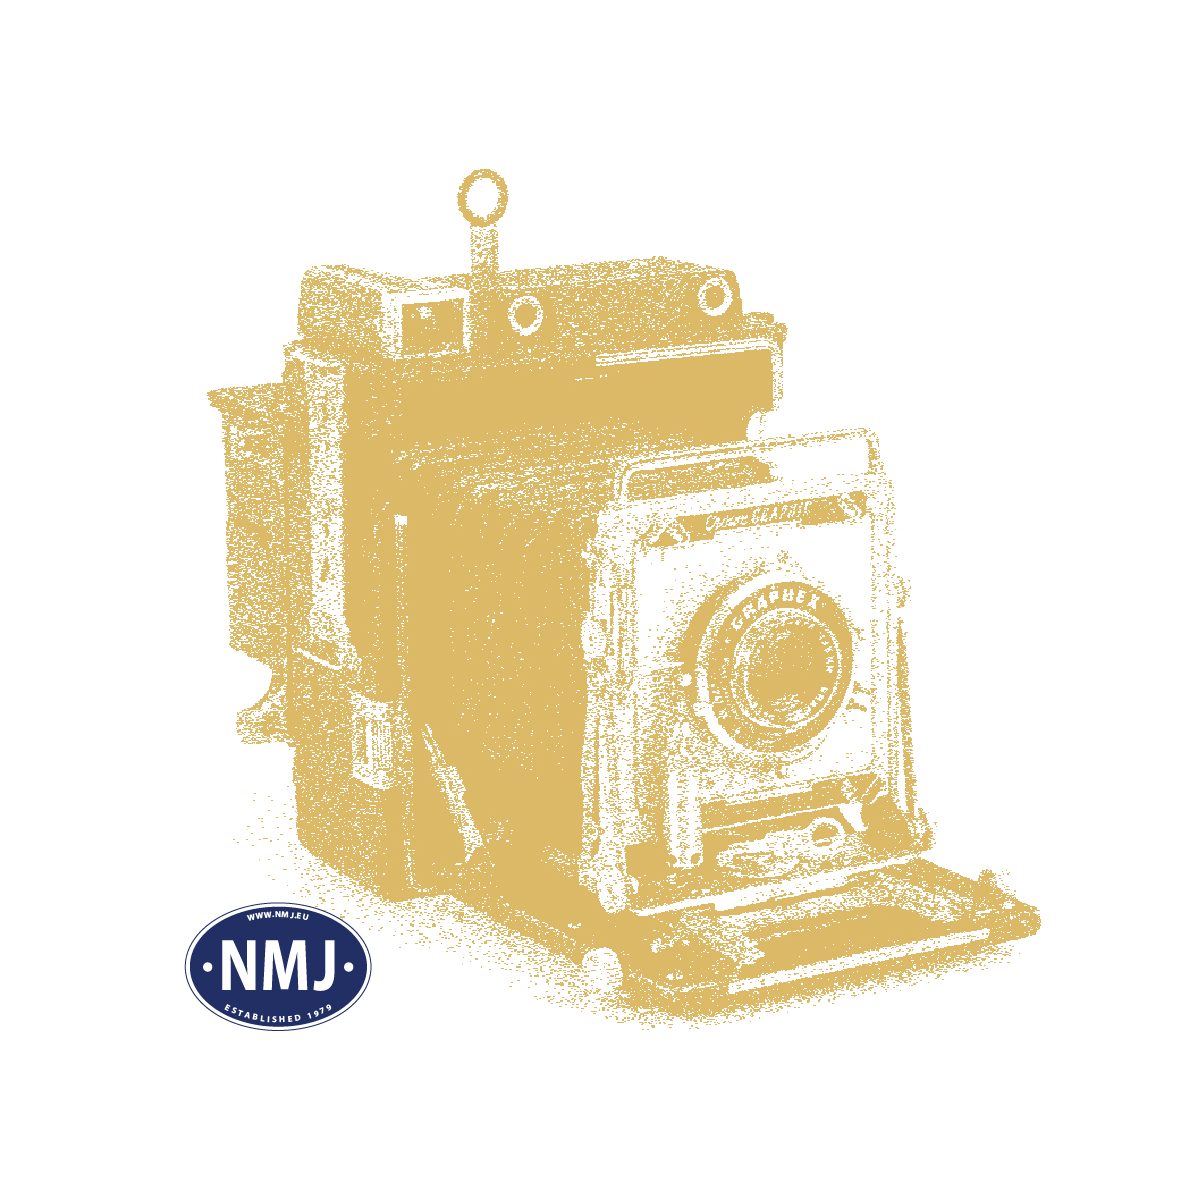 NOC36874 - Fjellklatrere, 6 Stk med tilbehør, N-Skala